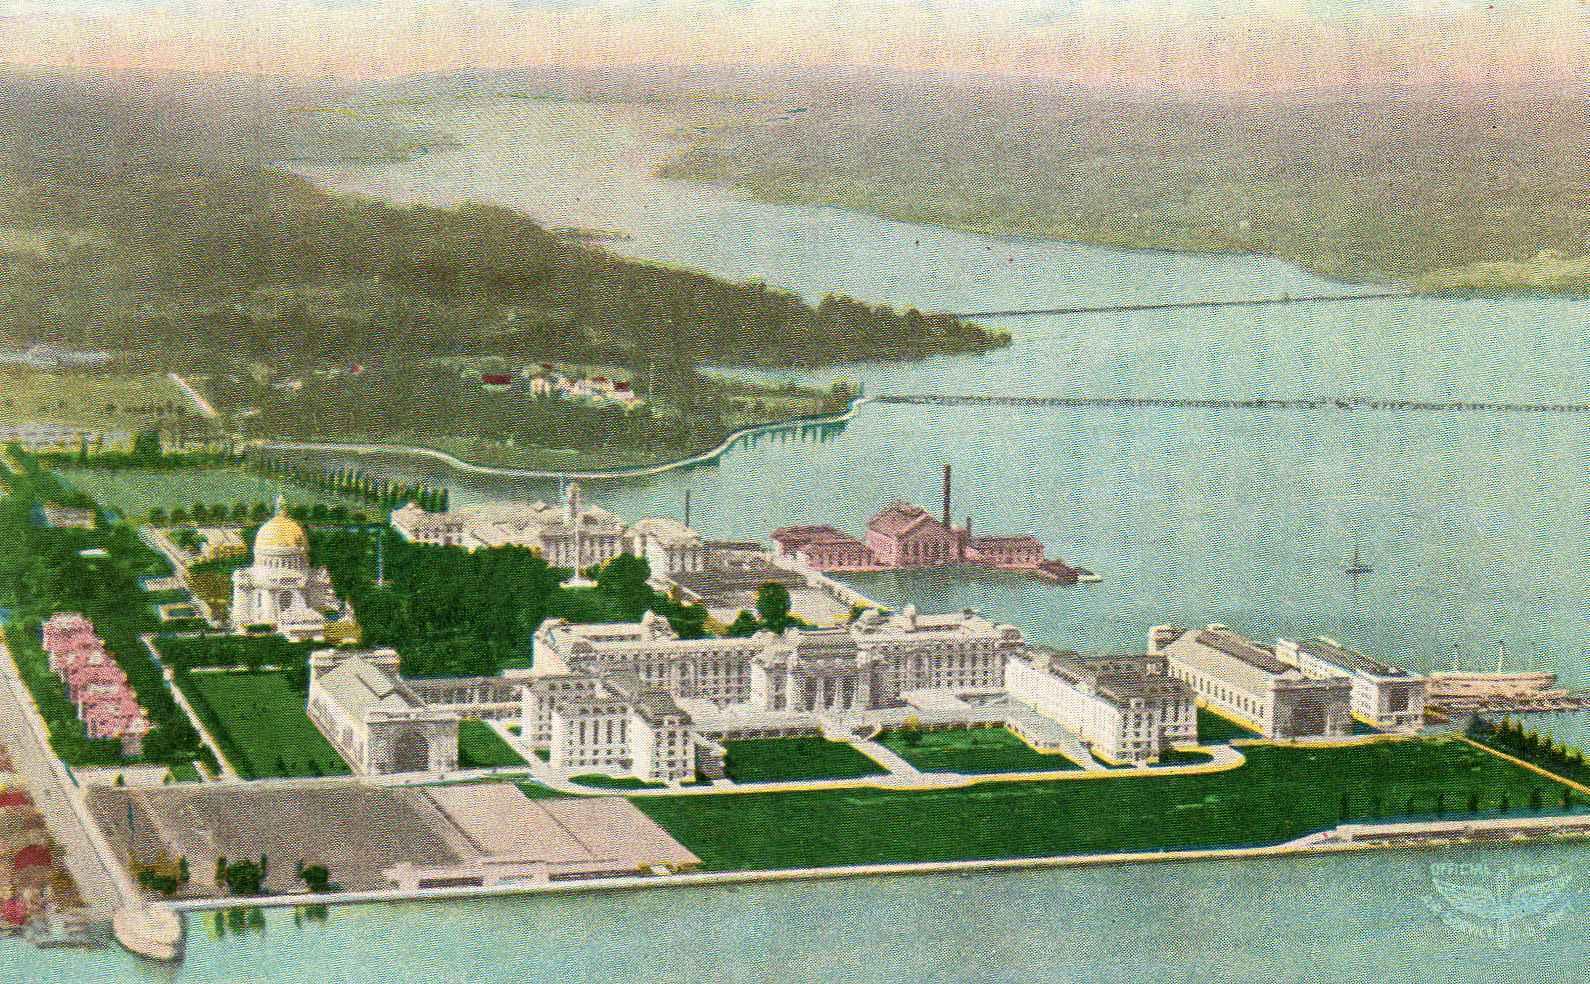 Washington-Baltimore-and-Annapolis-Railroad-Postcard-2-1.jpg